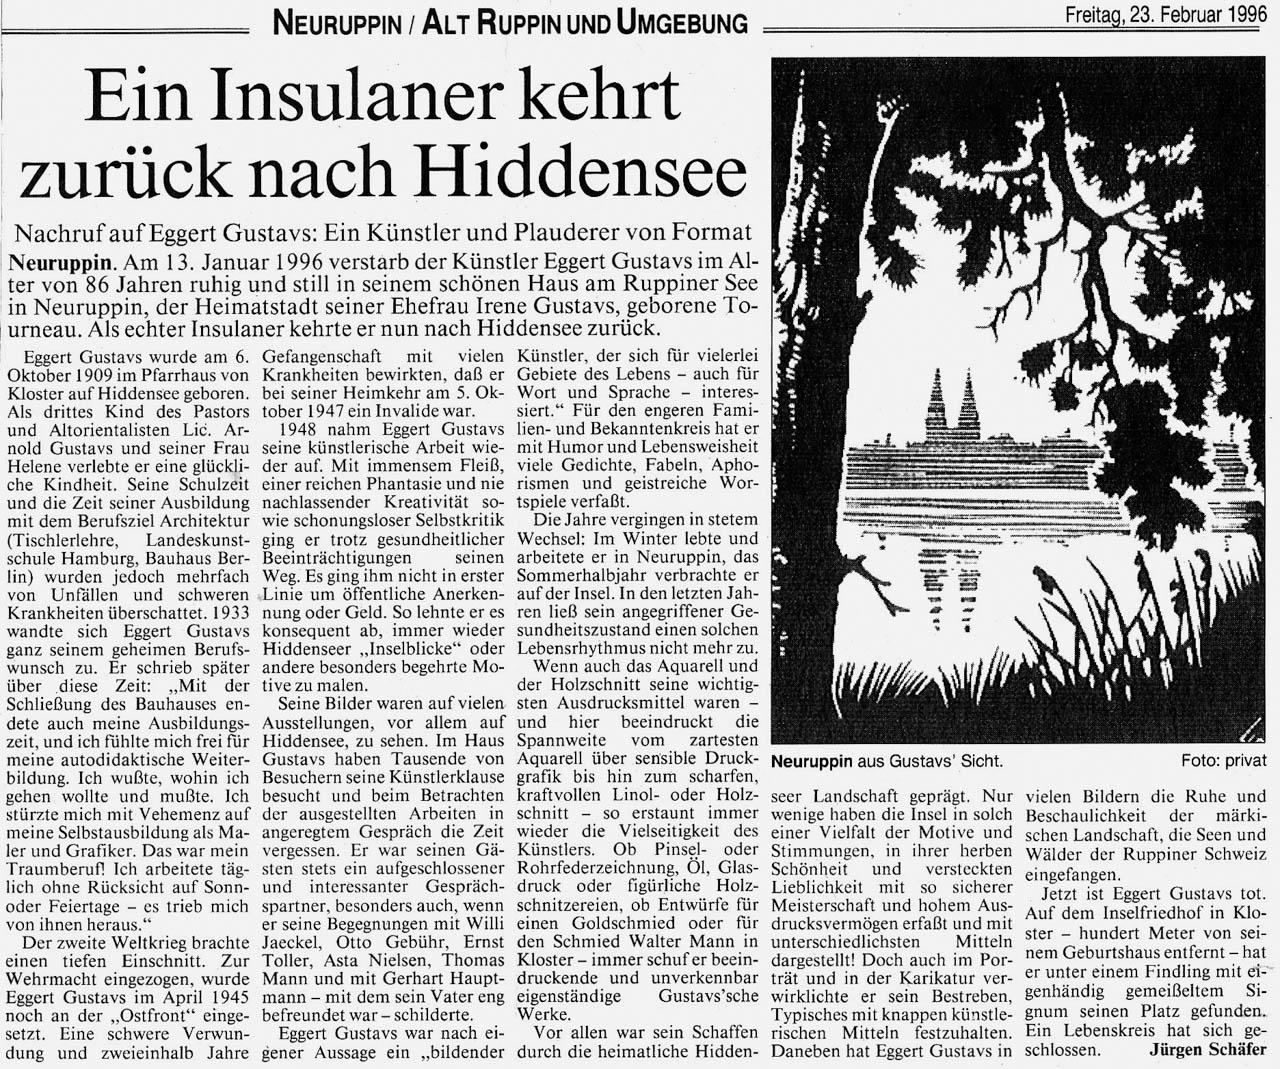 Ruppiner Anzeiger 23. Februar 1996